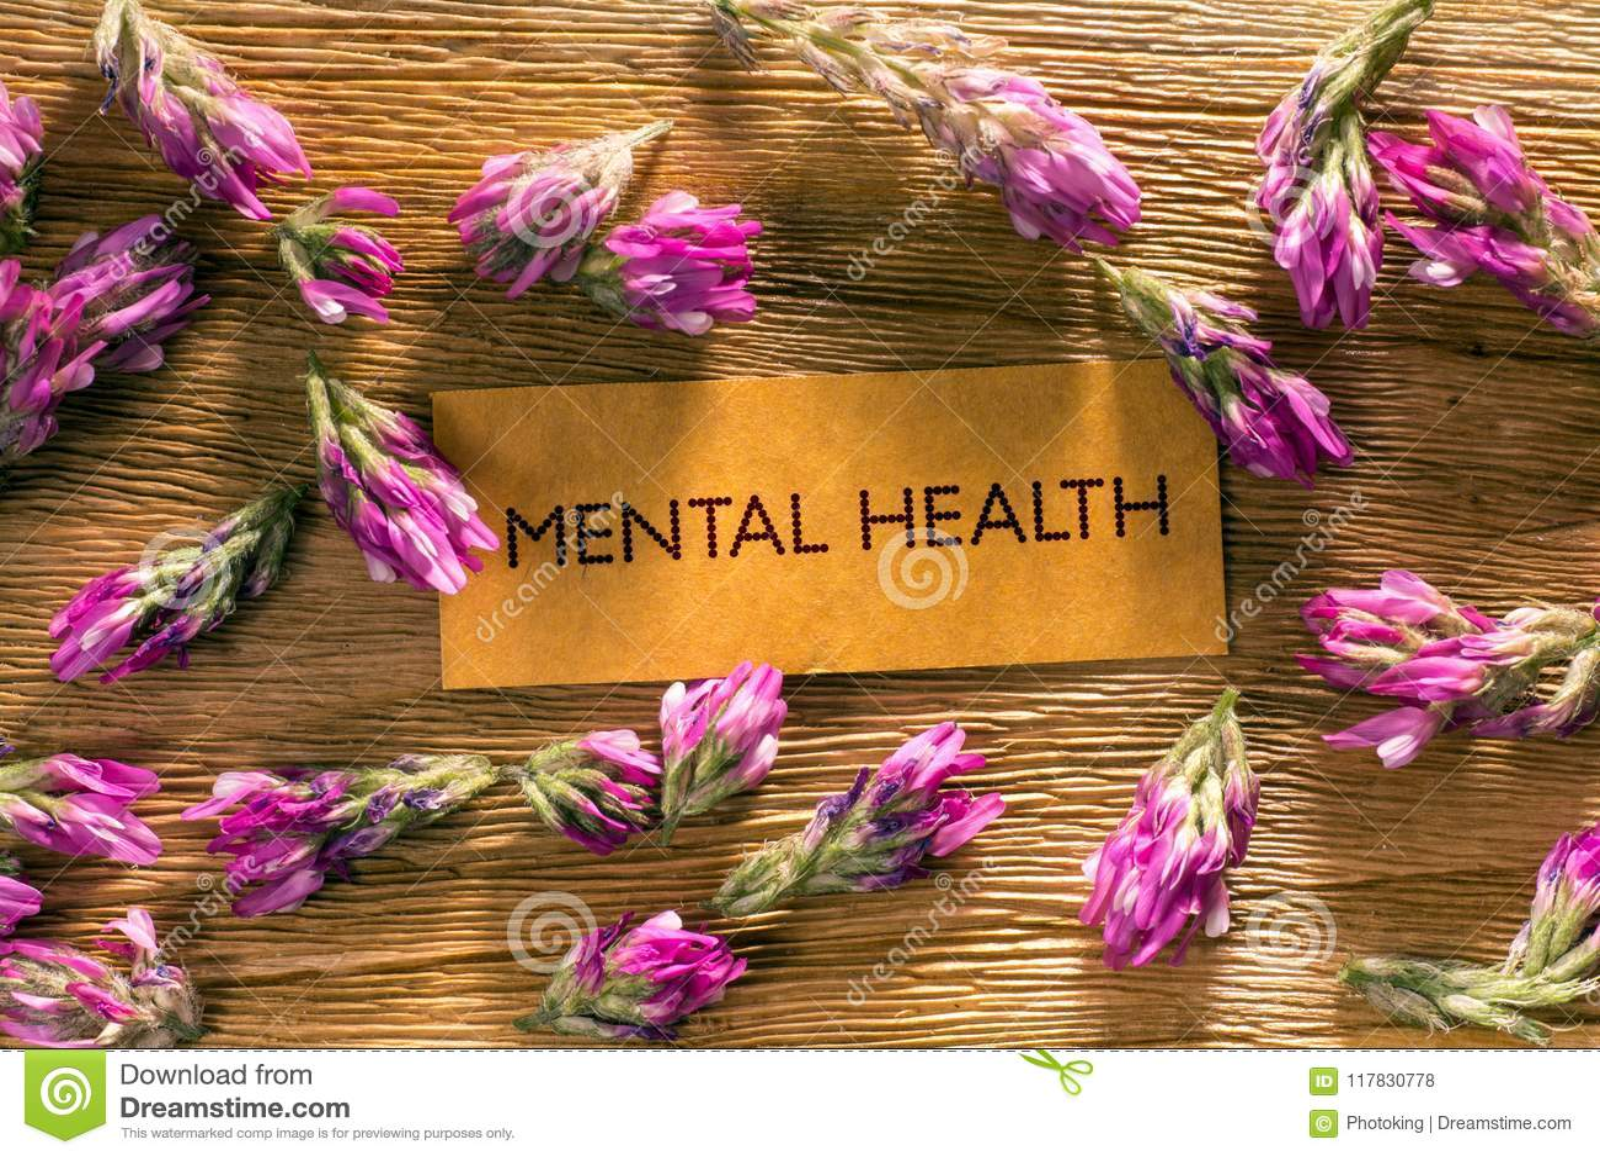 Mental Health stock photo. Image of word, wood, medicine